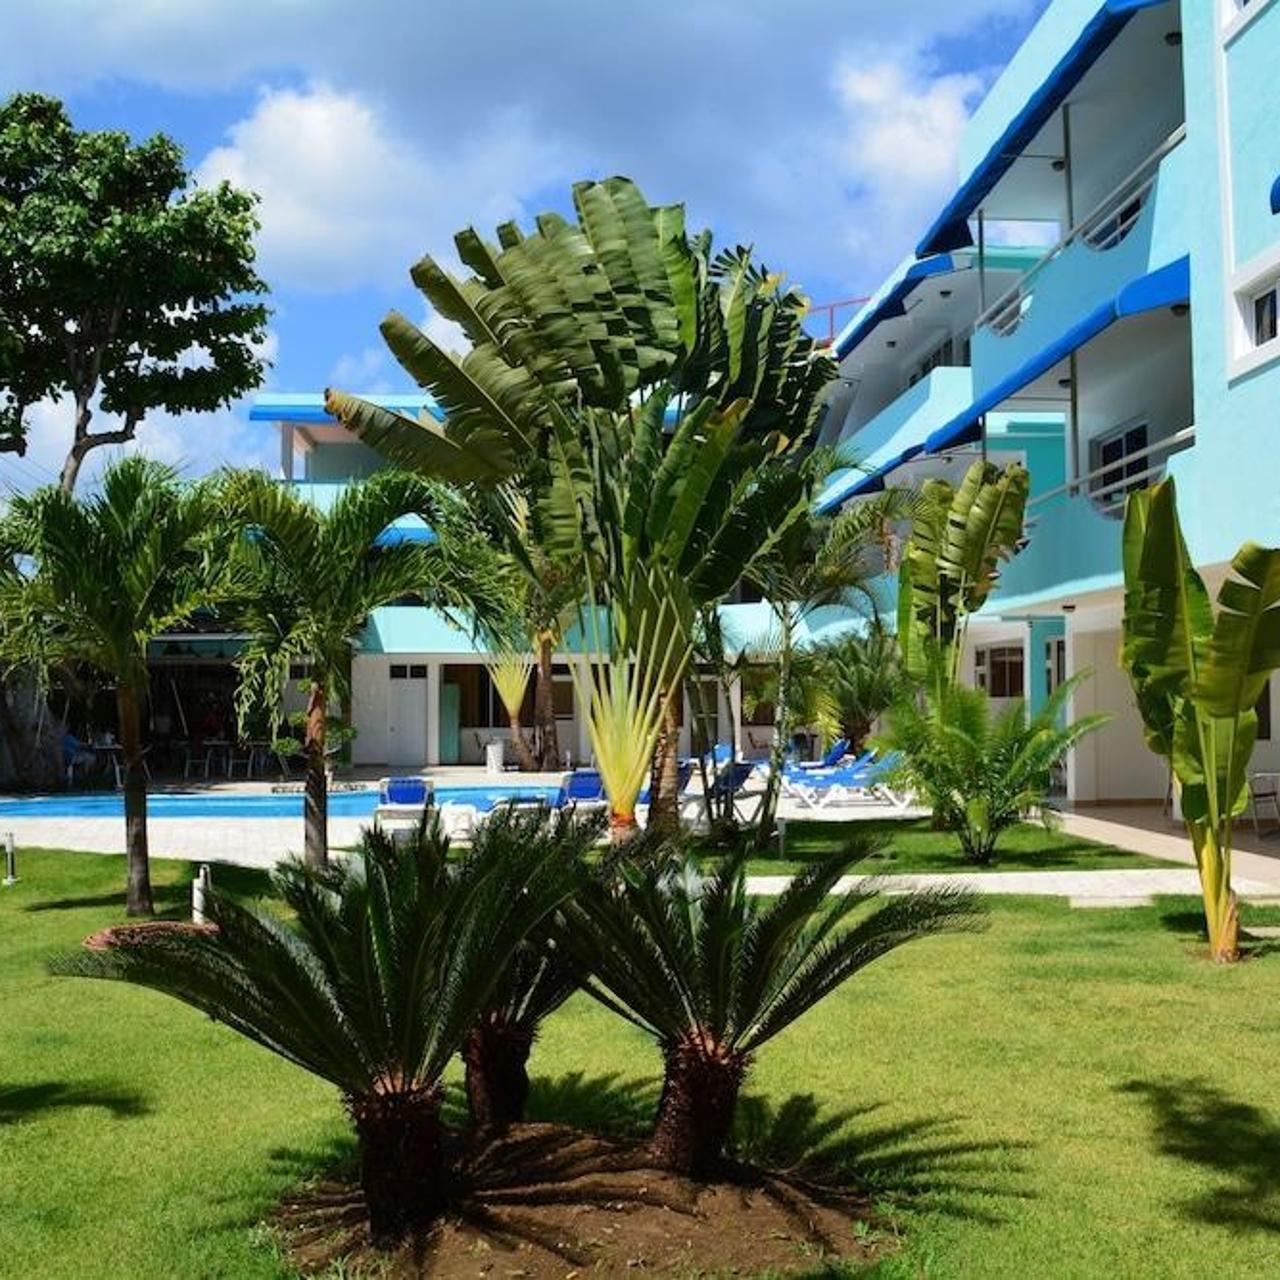 New Garden Hotel 3 Hrs Star Hotel In Sosua Provincia De Puerto Plata